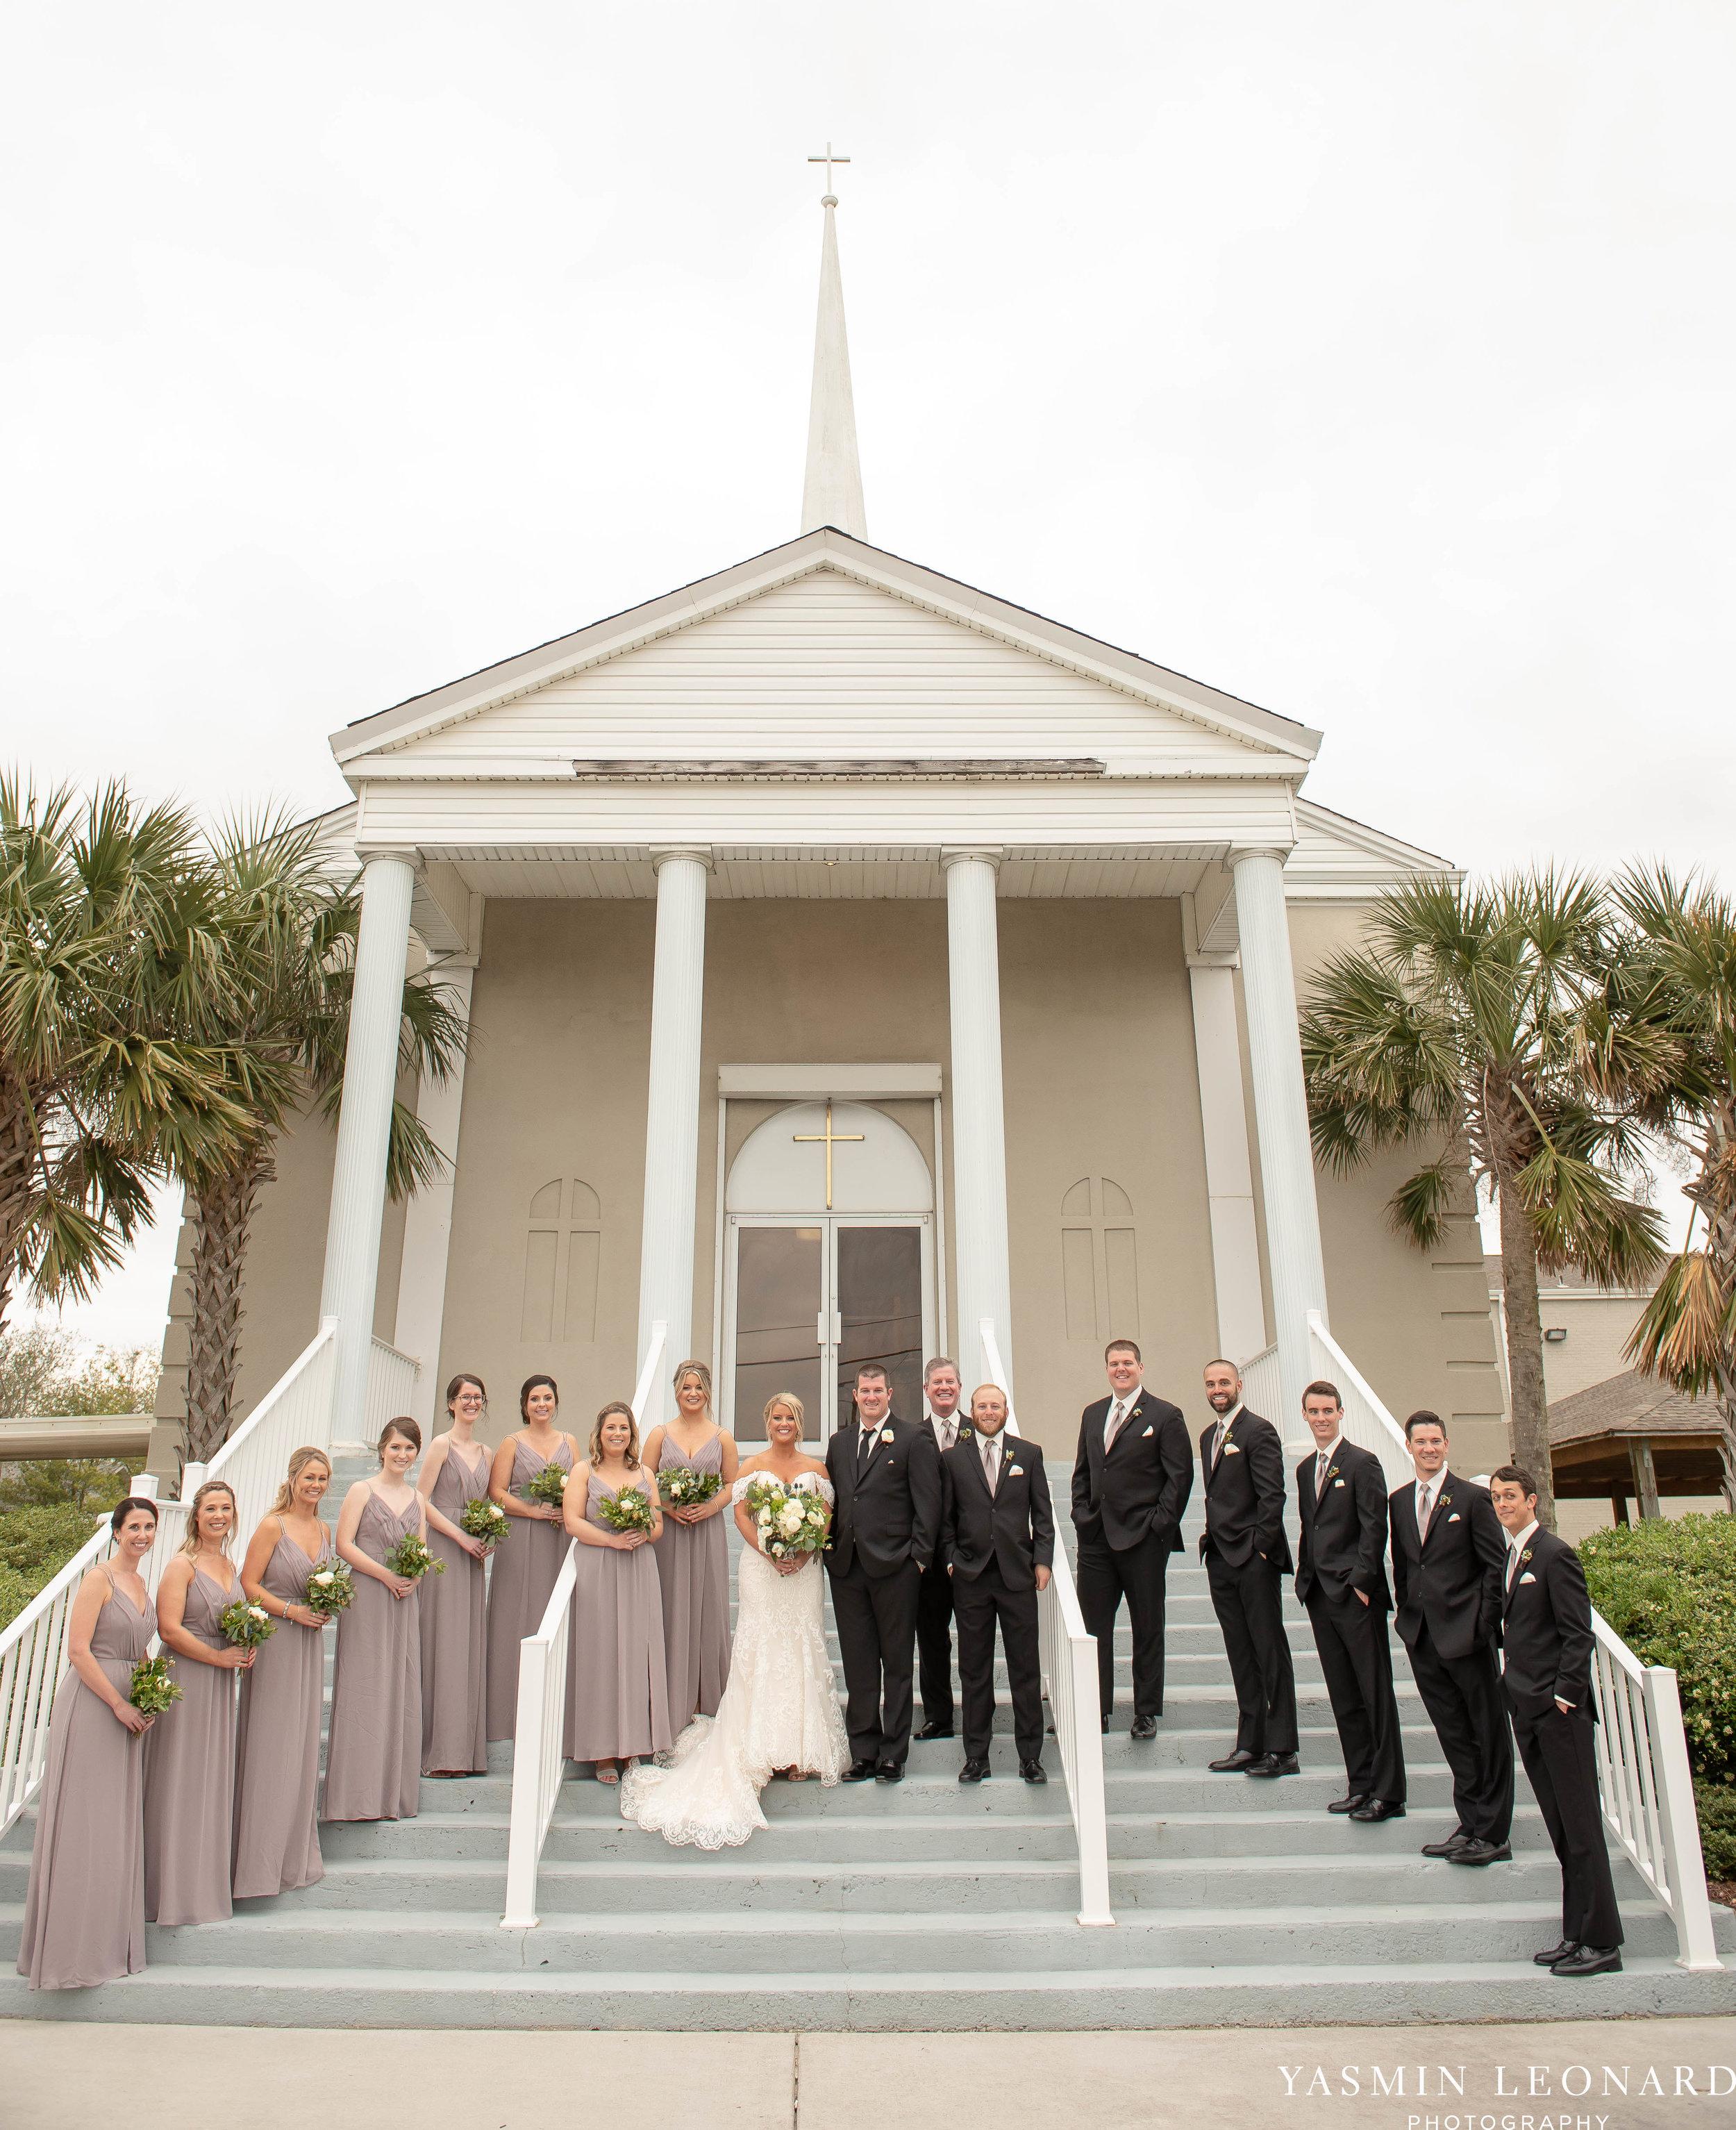 Carolina Beach Wedding - Fort Fisher Wedding - NC Acquarium - Beach Wedding - NC Wedding - Beach Wedding Inspiration - Beach Bride-24.jpg